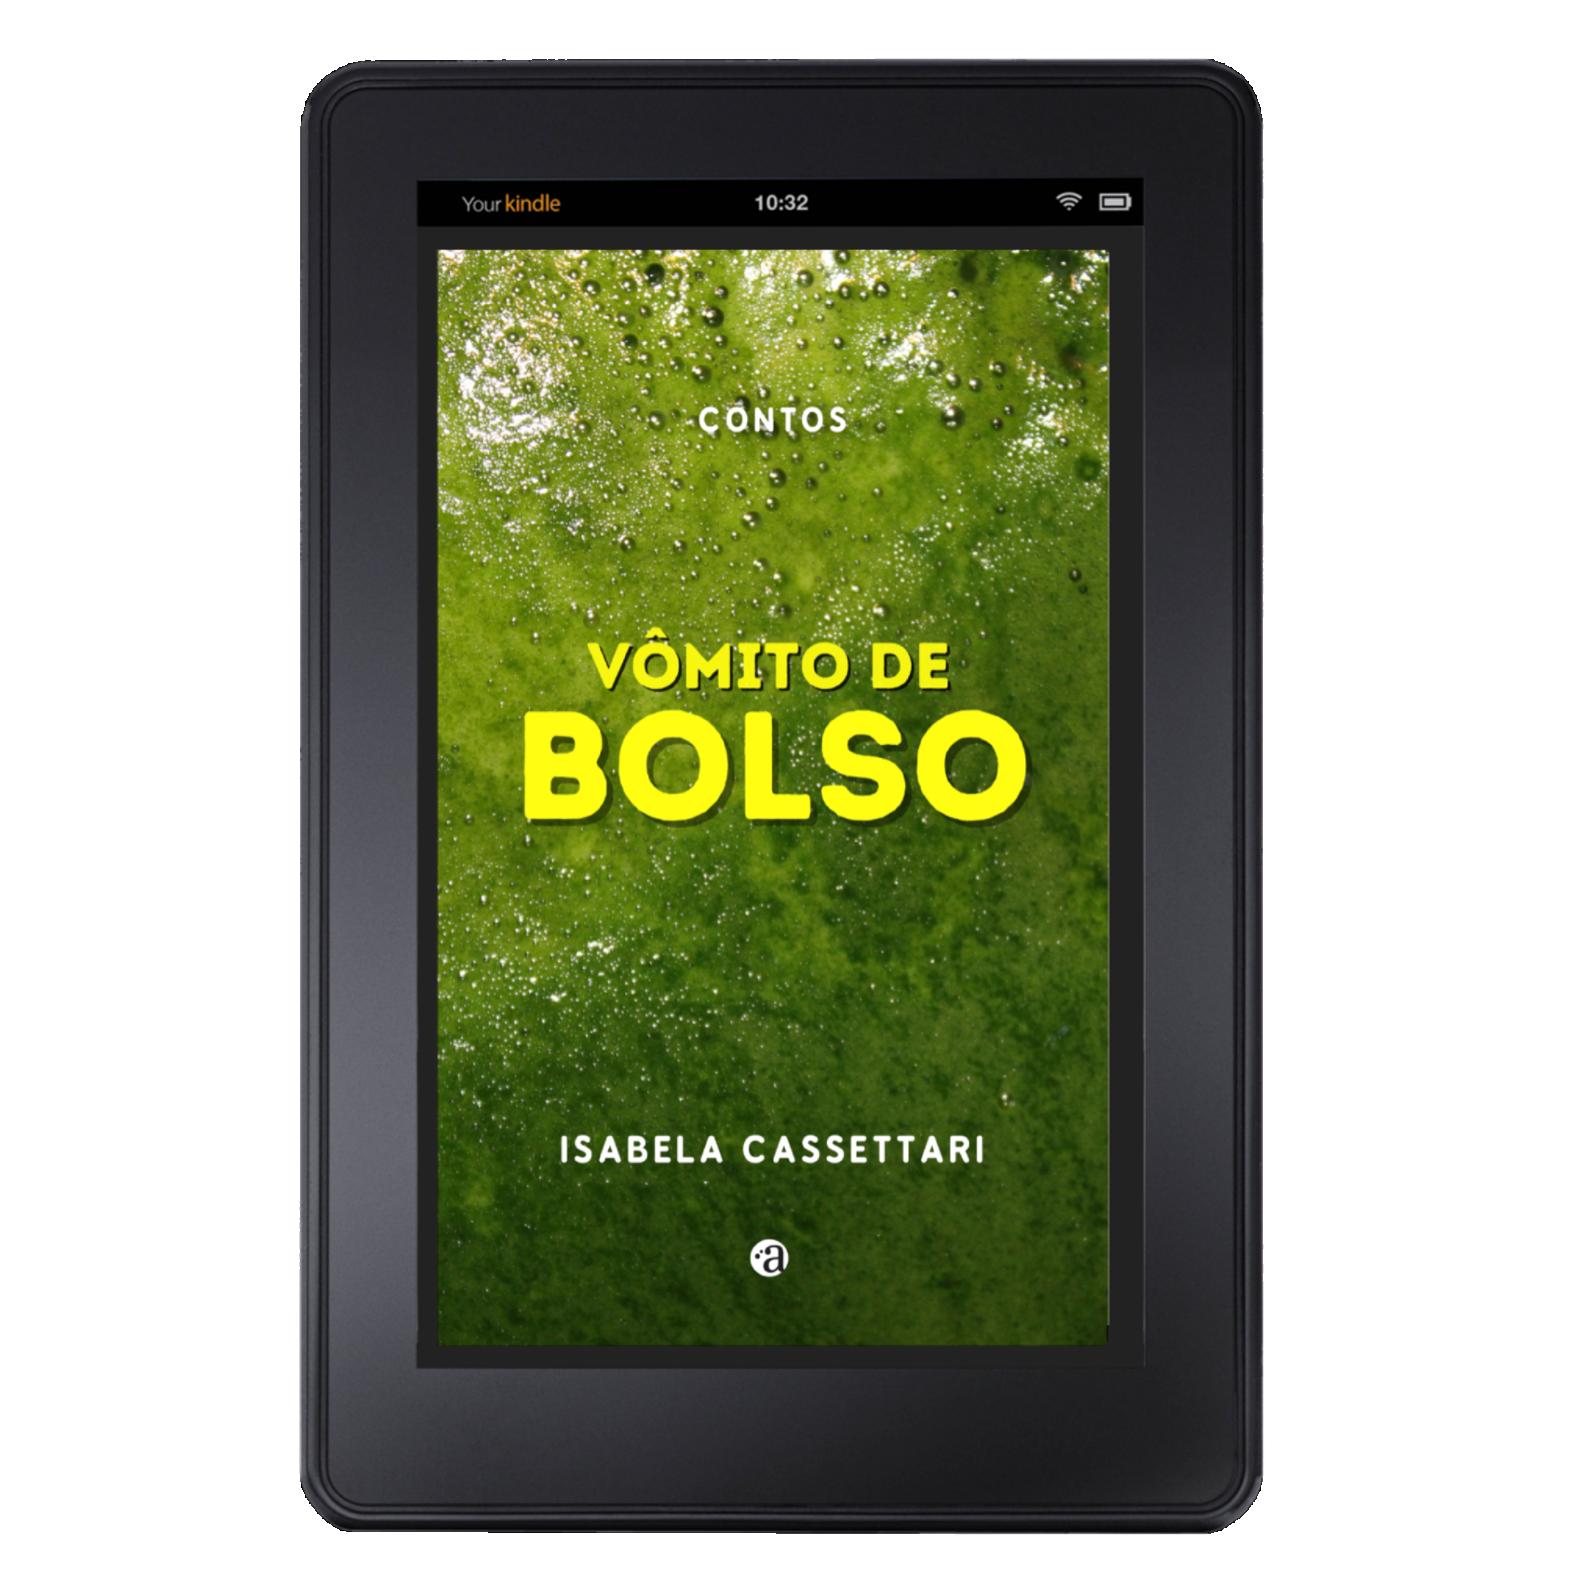 VÔMITO DE BOLSO